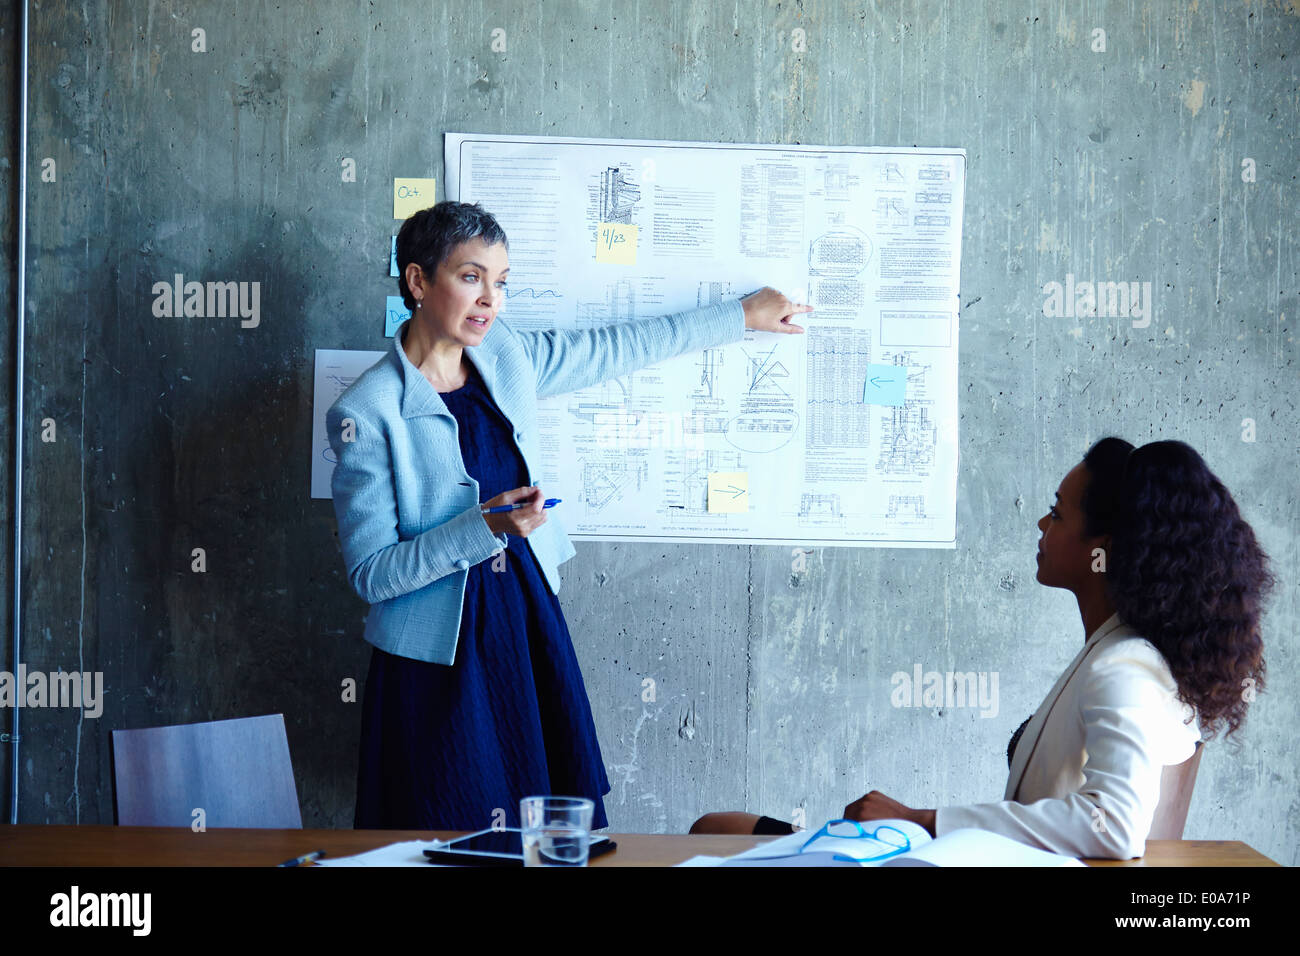 Empresarias maduras presentando ideas en sesión Imagen De Stock